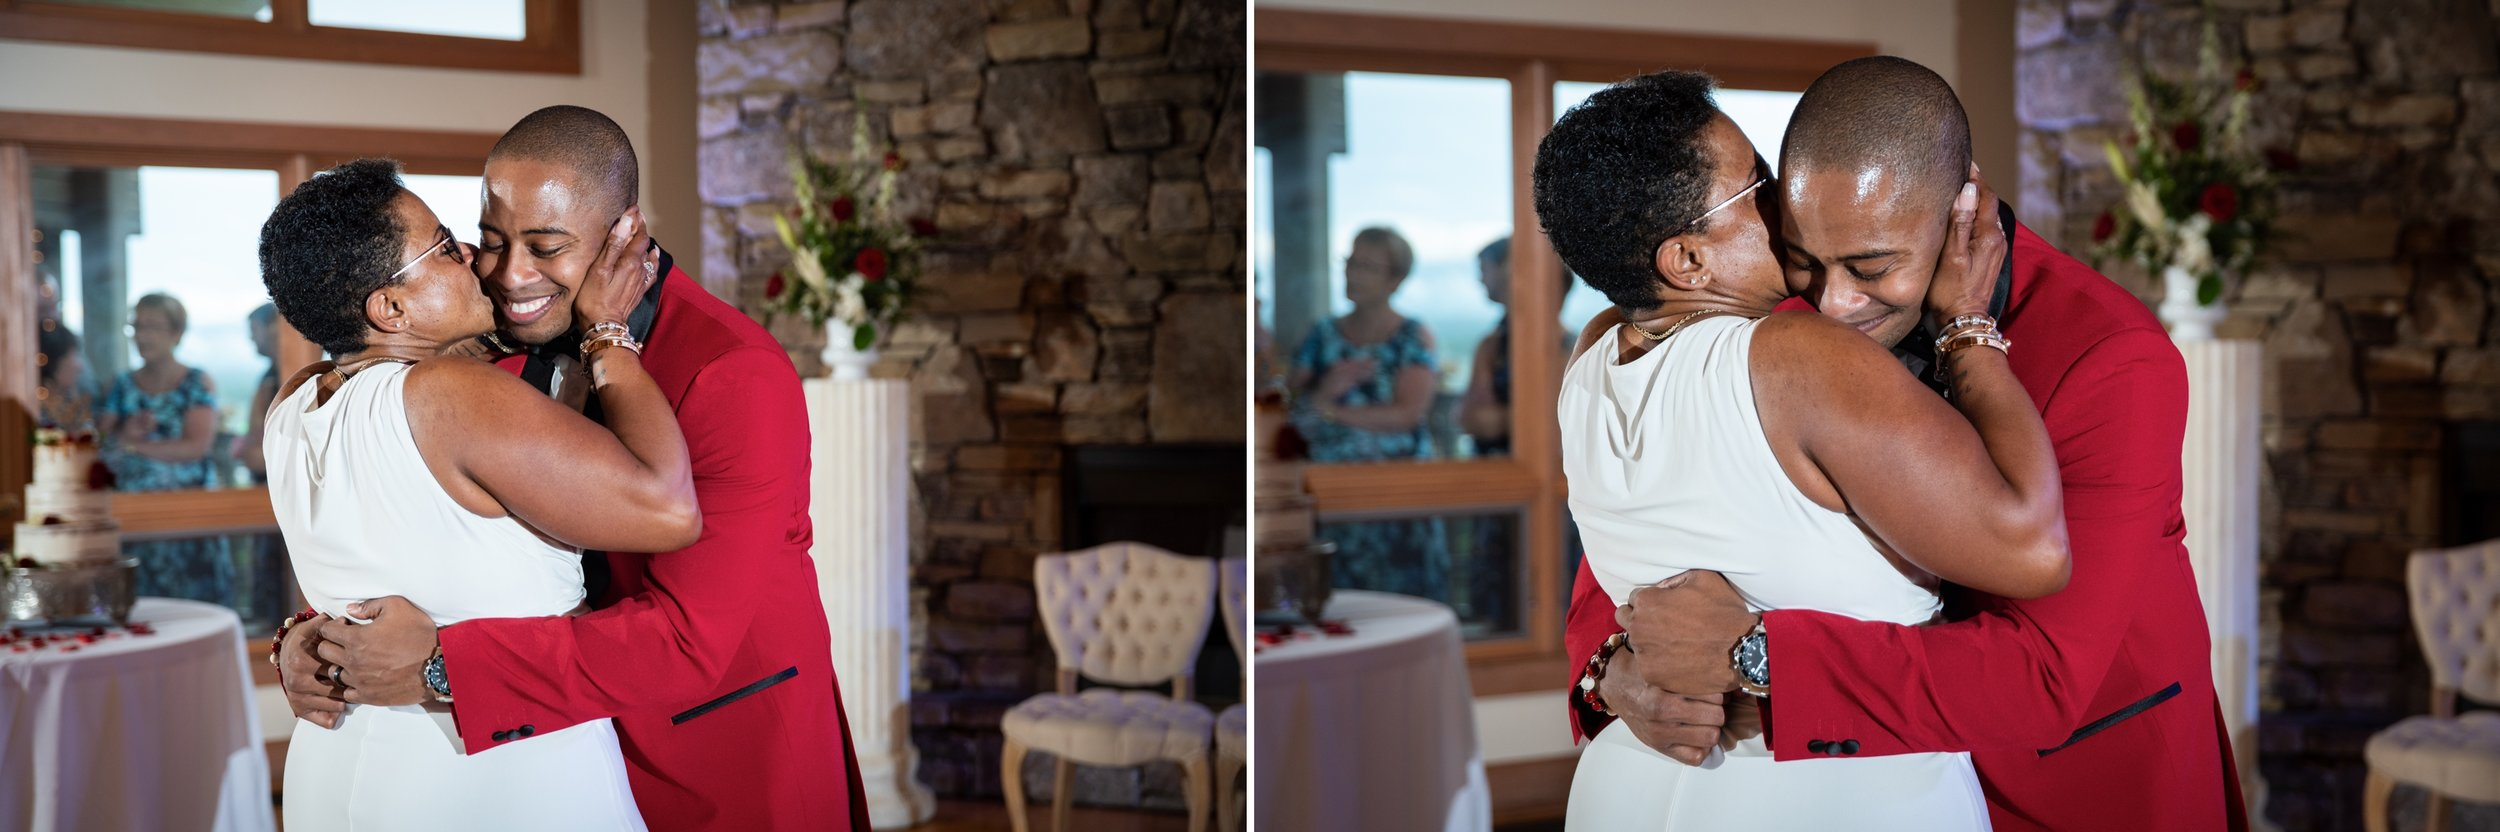 High Vista Weddings - Asheville Vendors 3 10.jpg